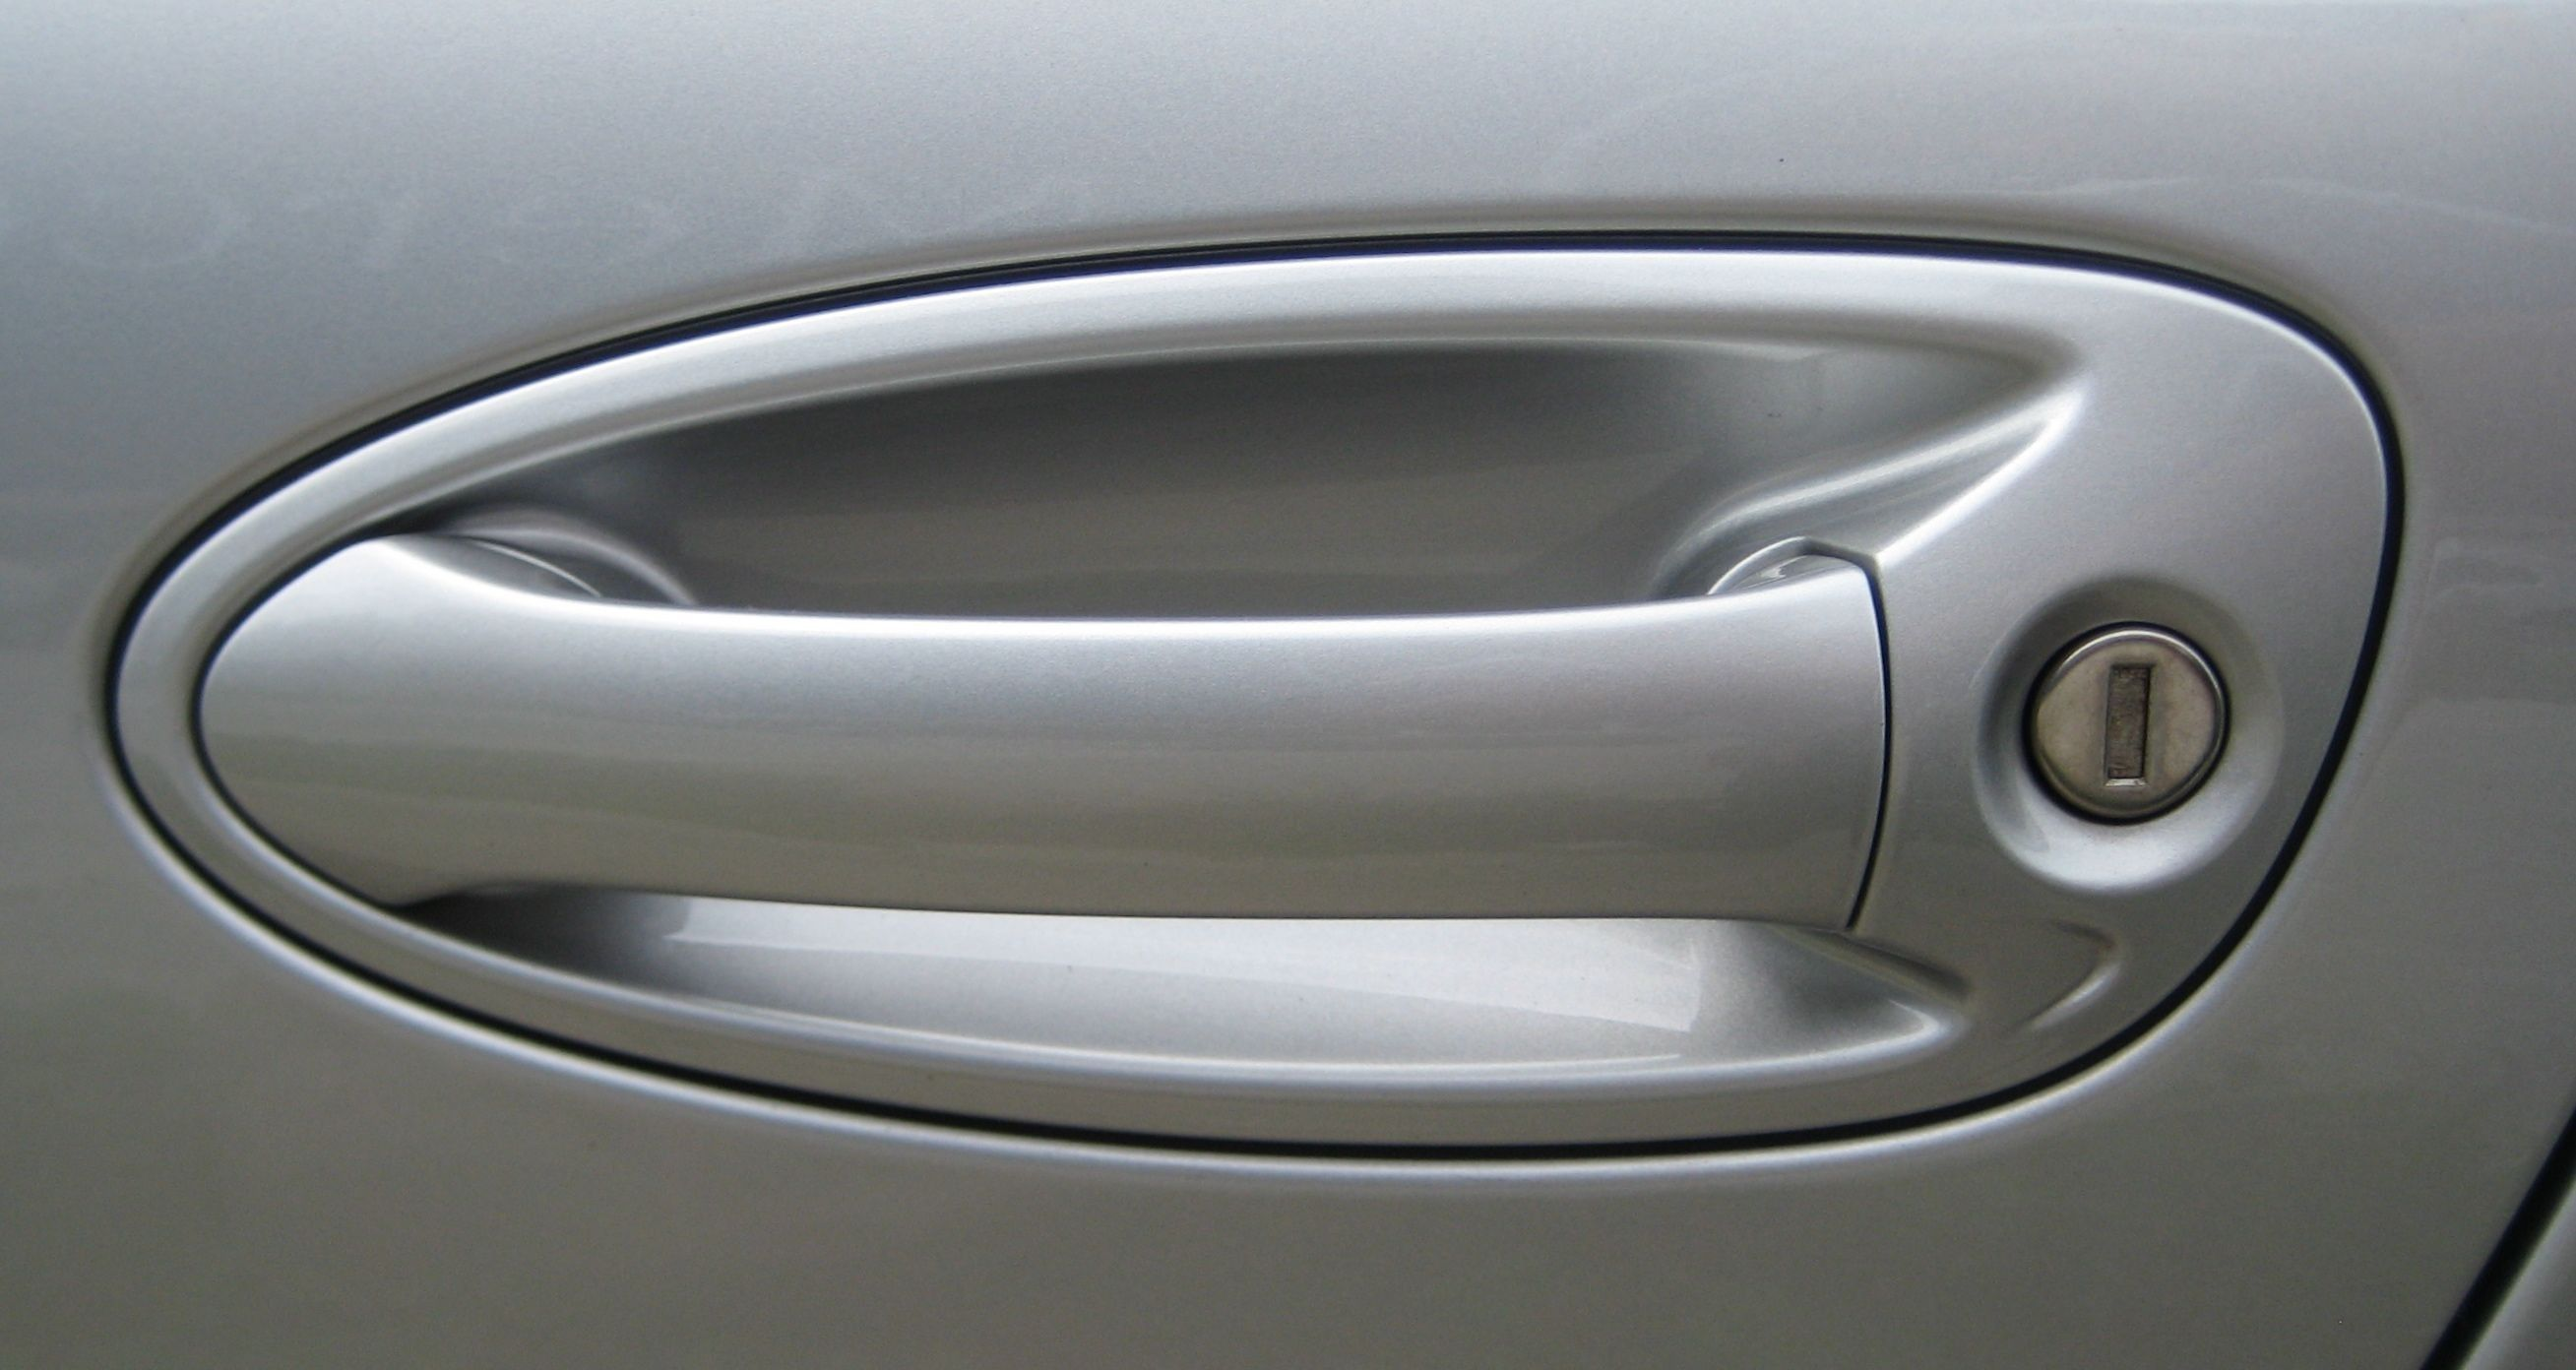 New Chrome Exterior Car Door Handles Home Furniture One